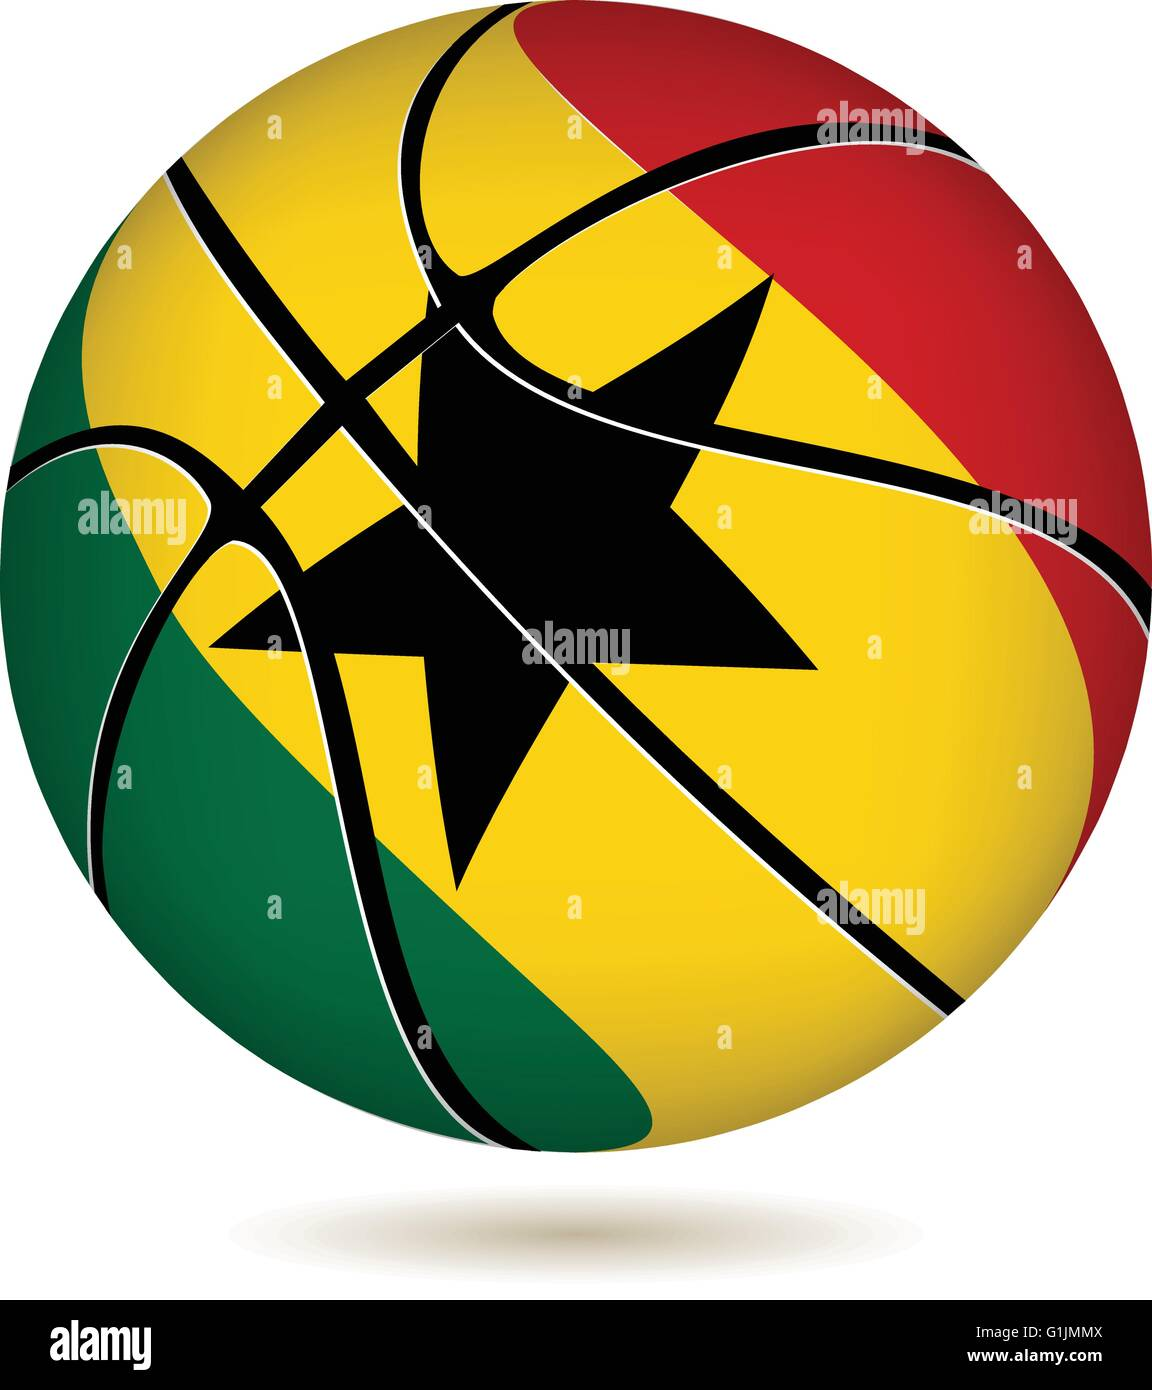 EPS 10 Vector. Basketball ball with Ghana flag on white. - Stock Vector